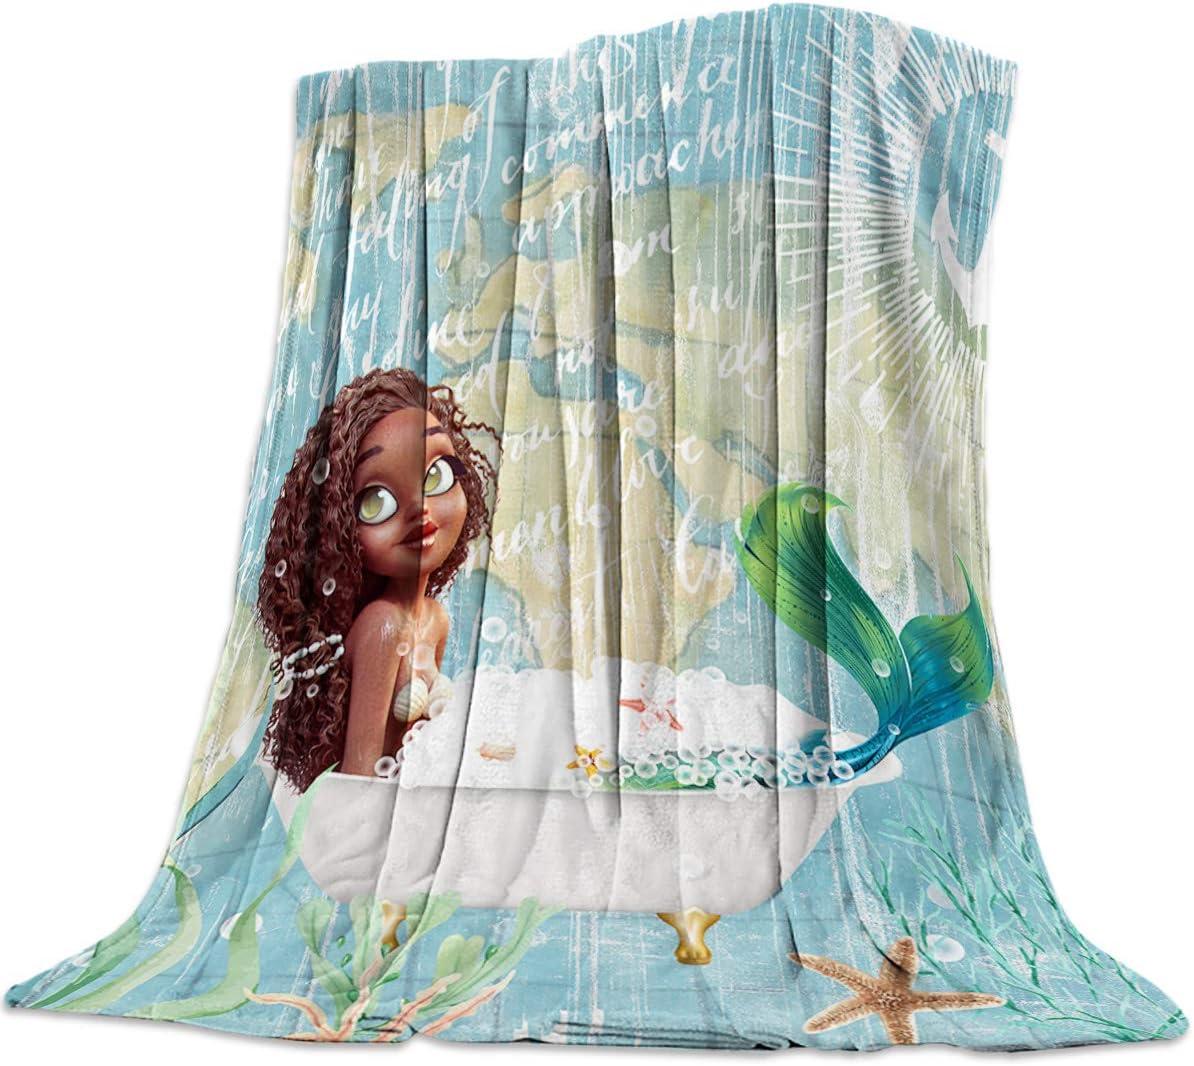 CHARMHOME Flannel Fleece Microfiber discount Throw Blanket Girls Superior Cu Black